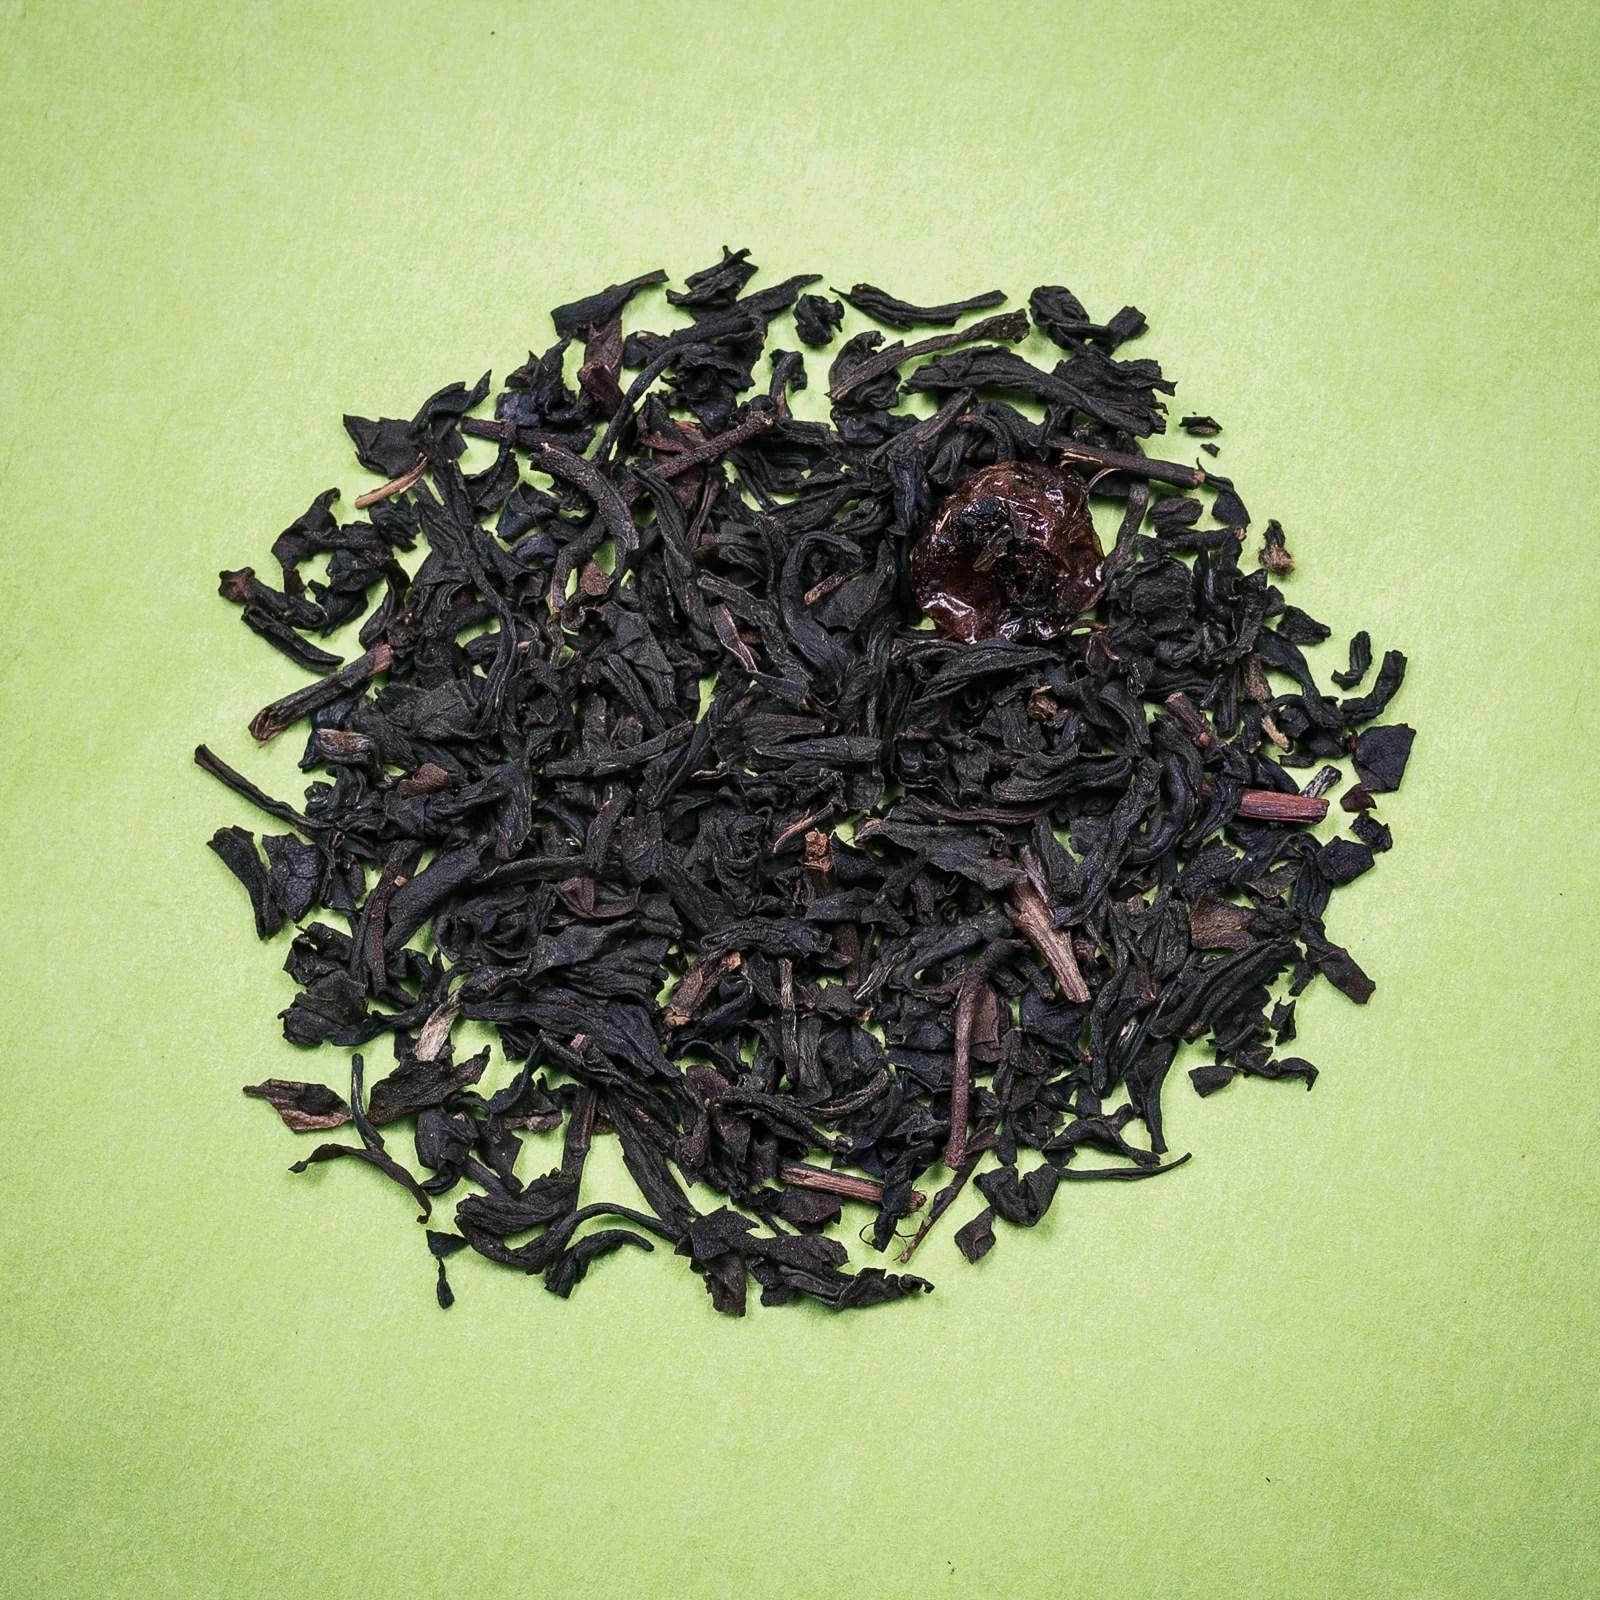 Anbassa-artisan-torrefacteur-the-noir-aromatise-Trois-Fruits-Noirs-GUP